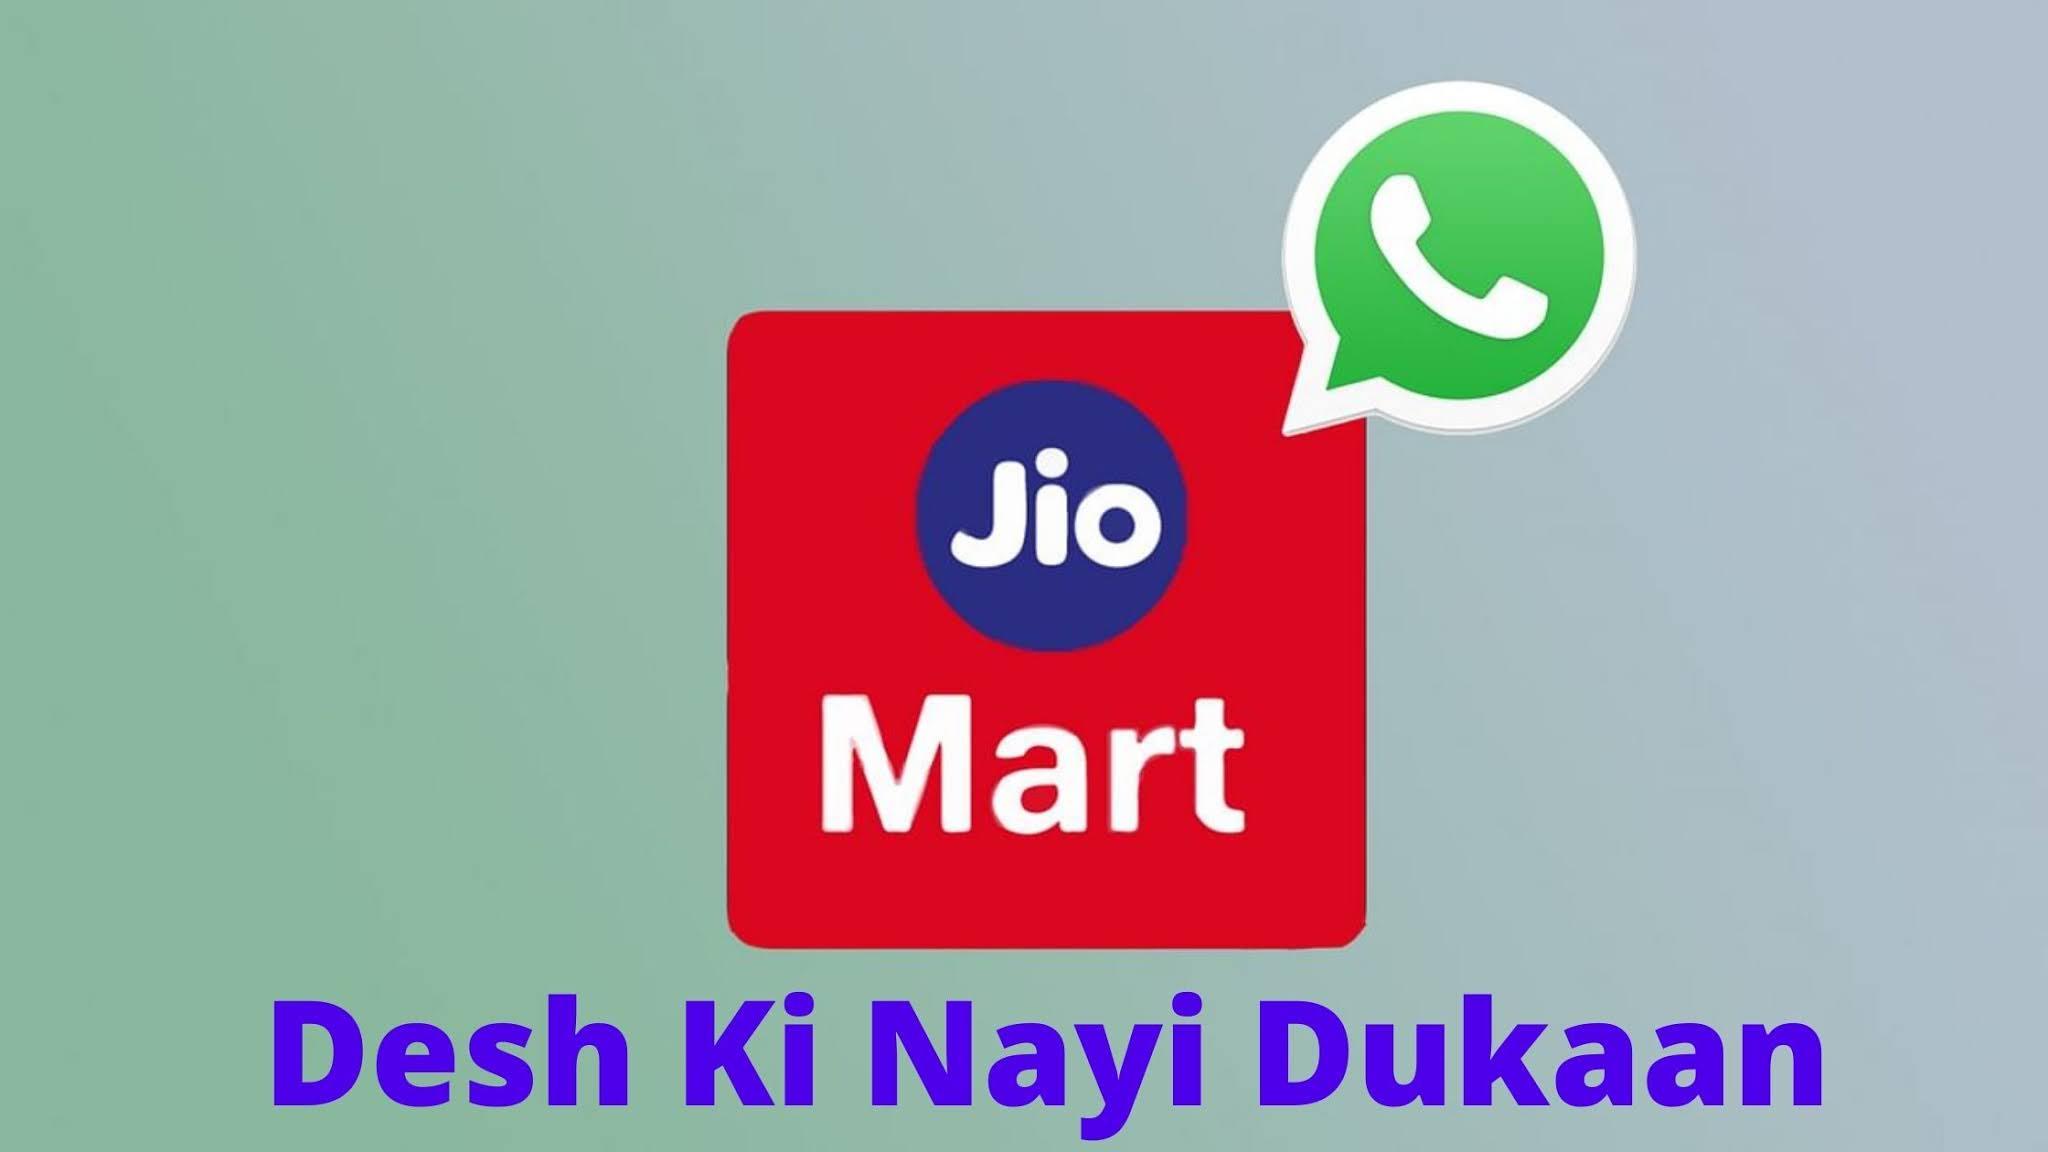 JioMart in Hindi